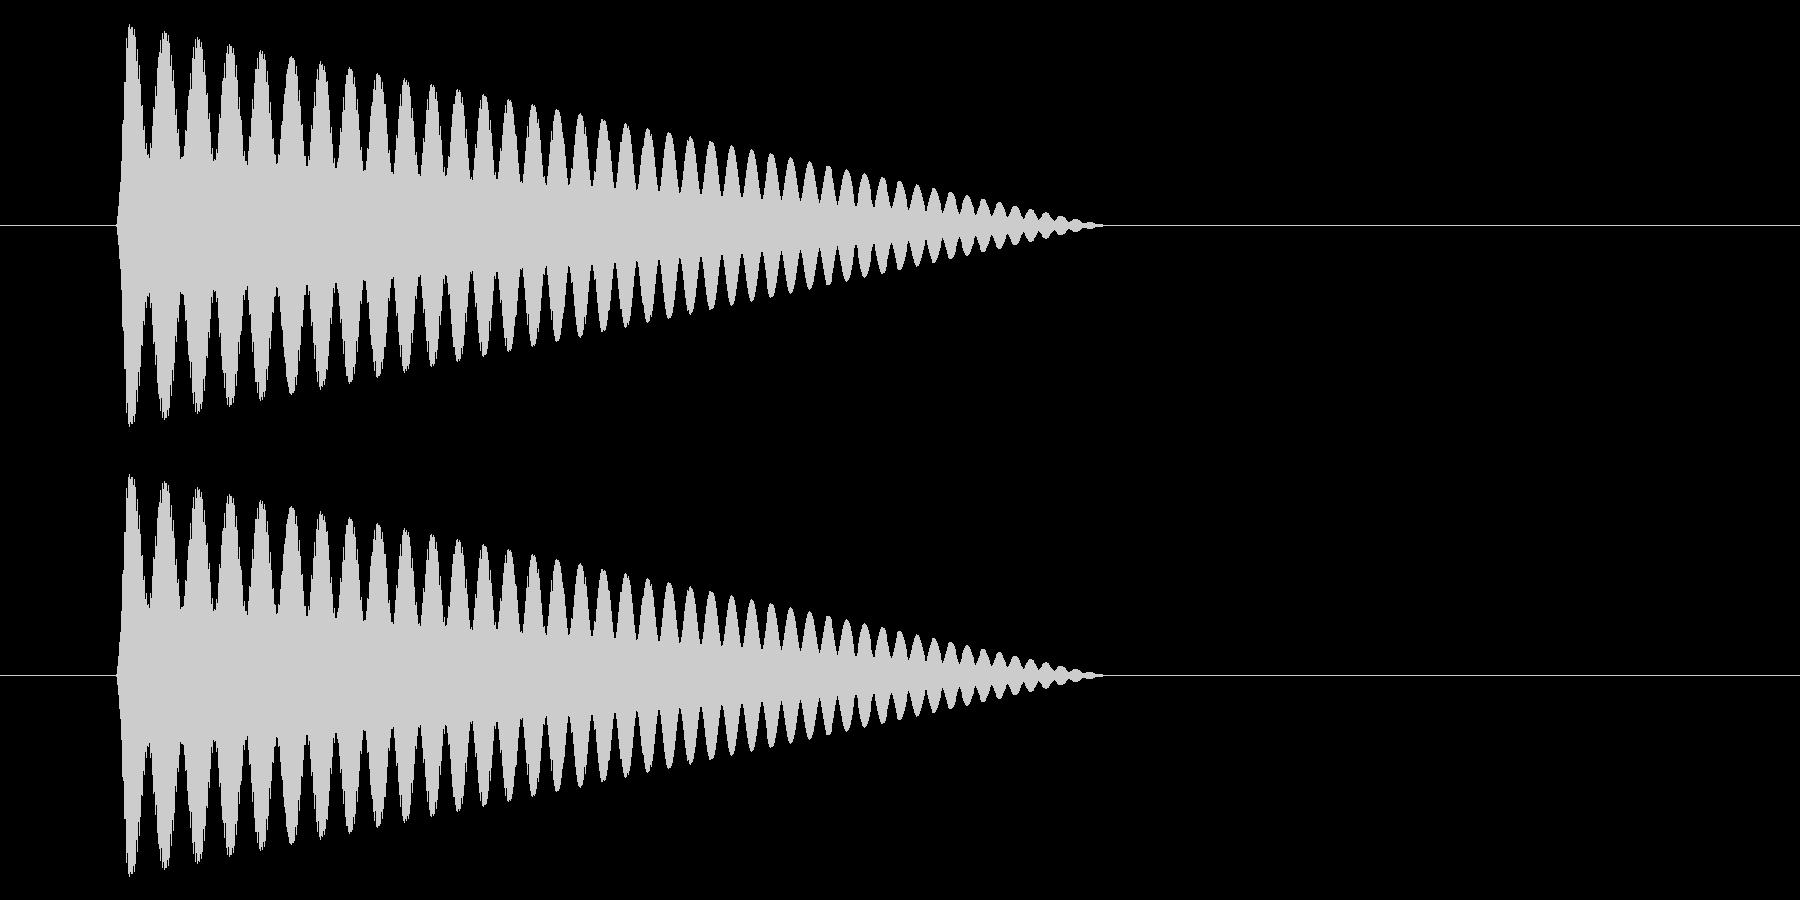 SNES シューティング01-08(アイの未再生の波形